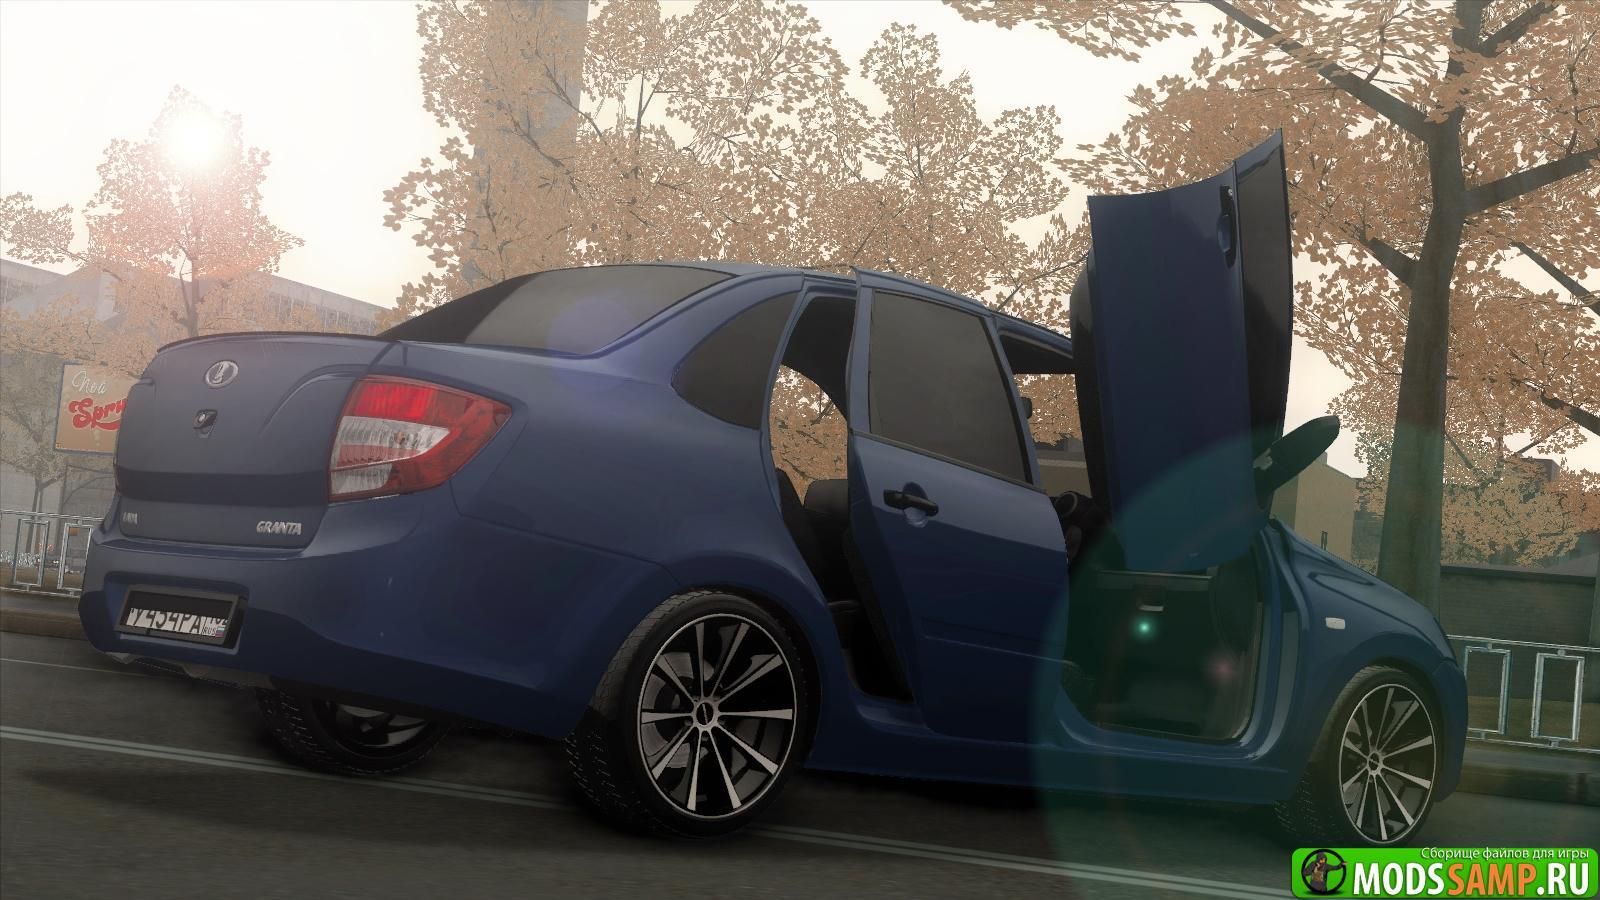 Lada Granta Sedan для GTA:SA